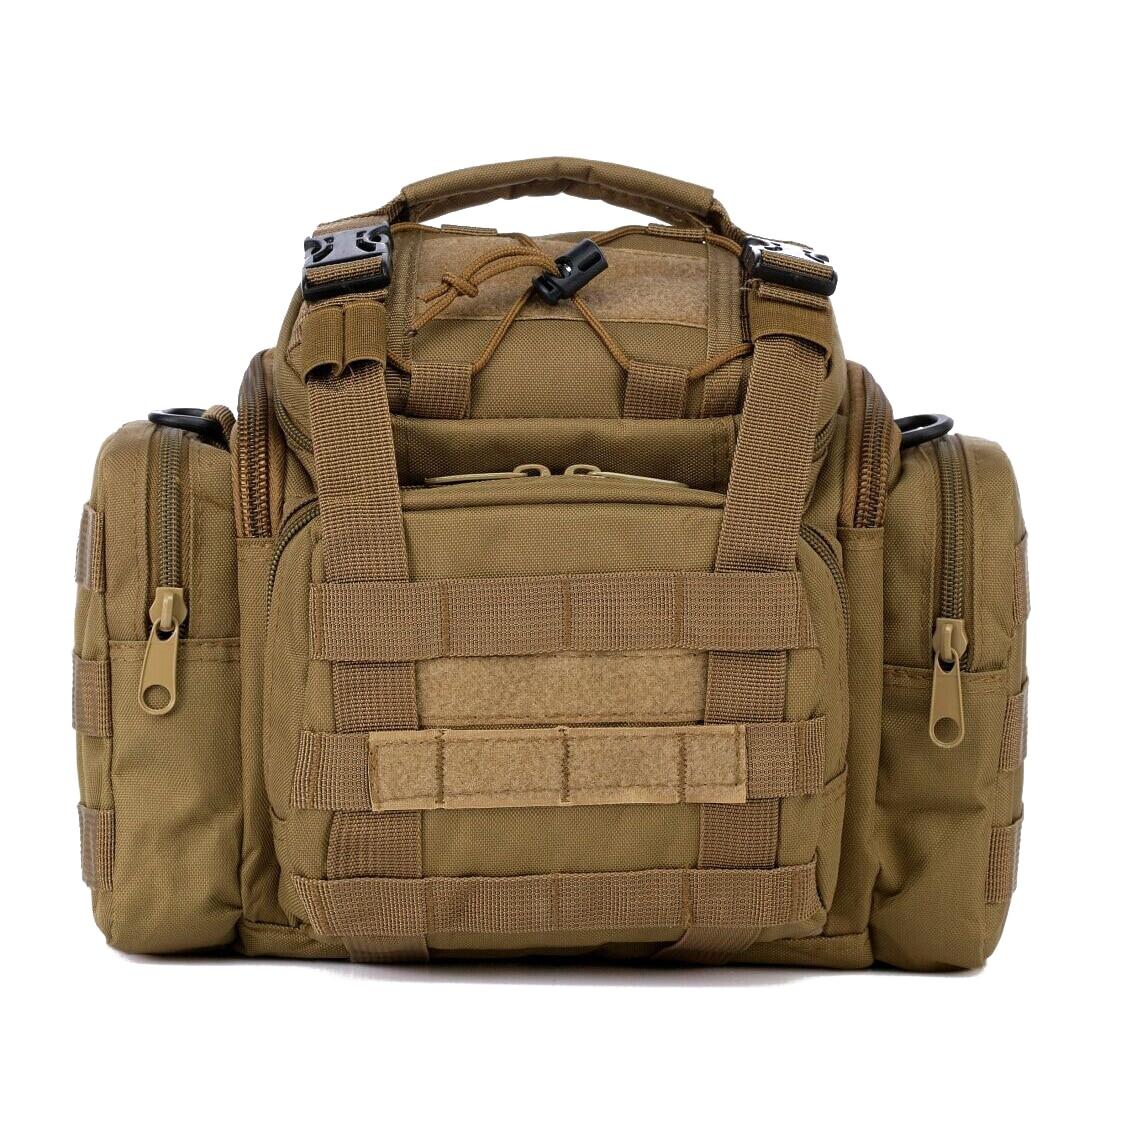 JHO-Sea/<font><b>Carp</b></font>/Fly Fishing Tackle Bag Waterproof Storage Waist Shoulder Carry Case sandy